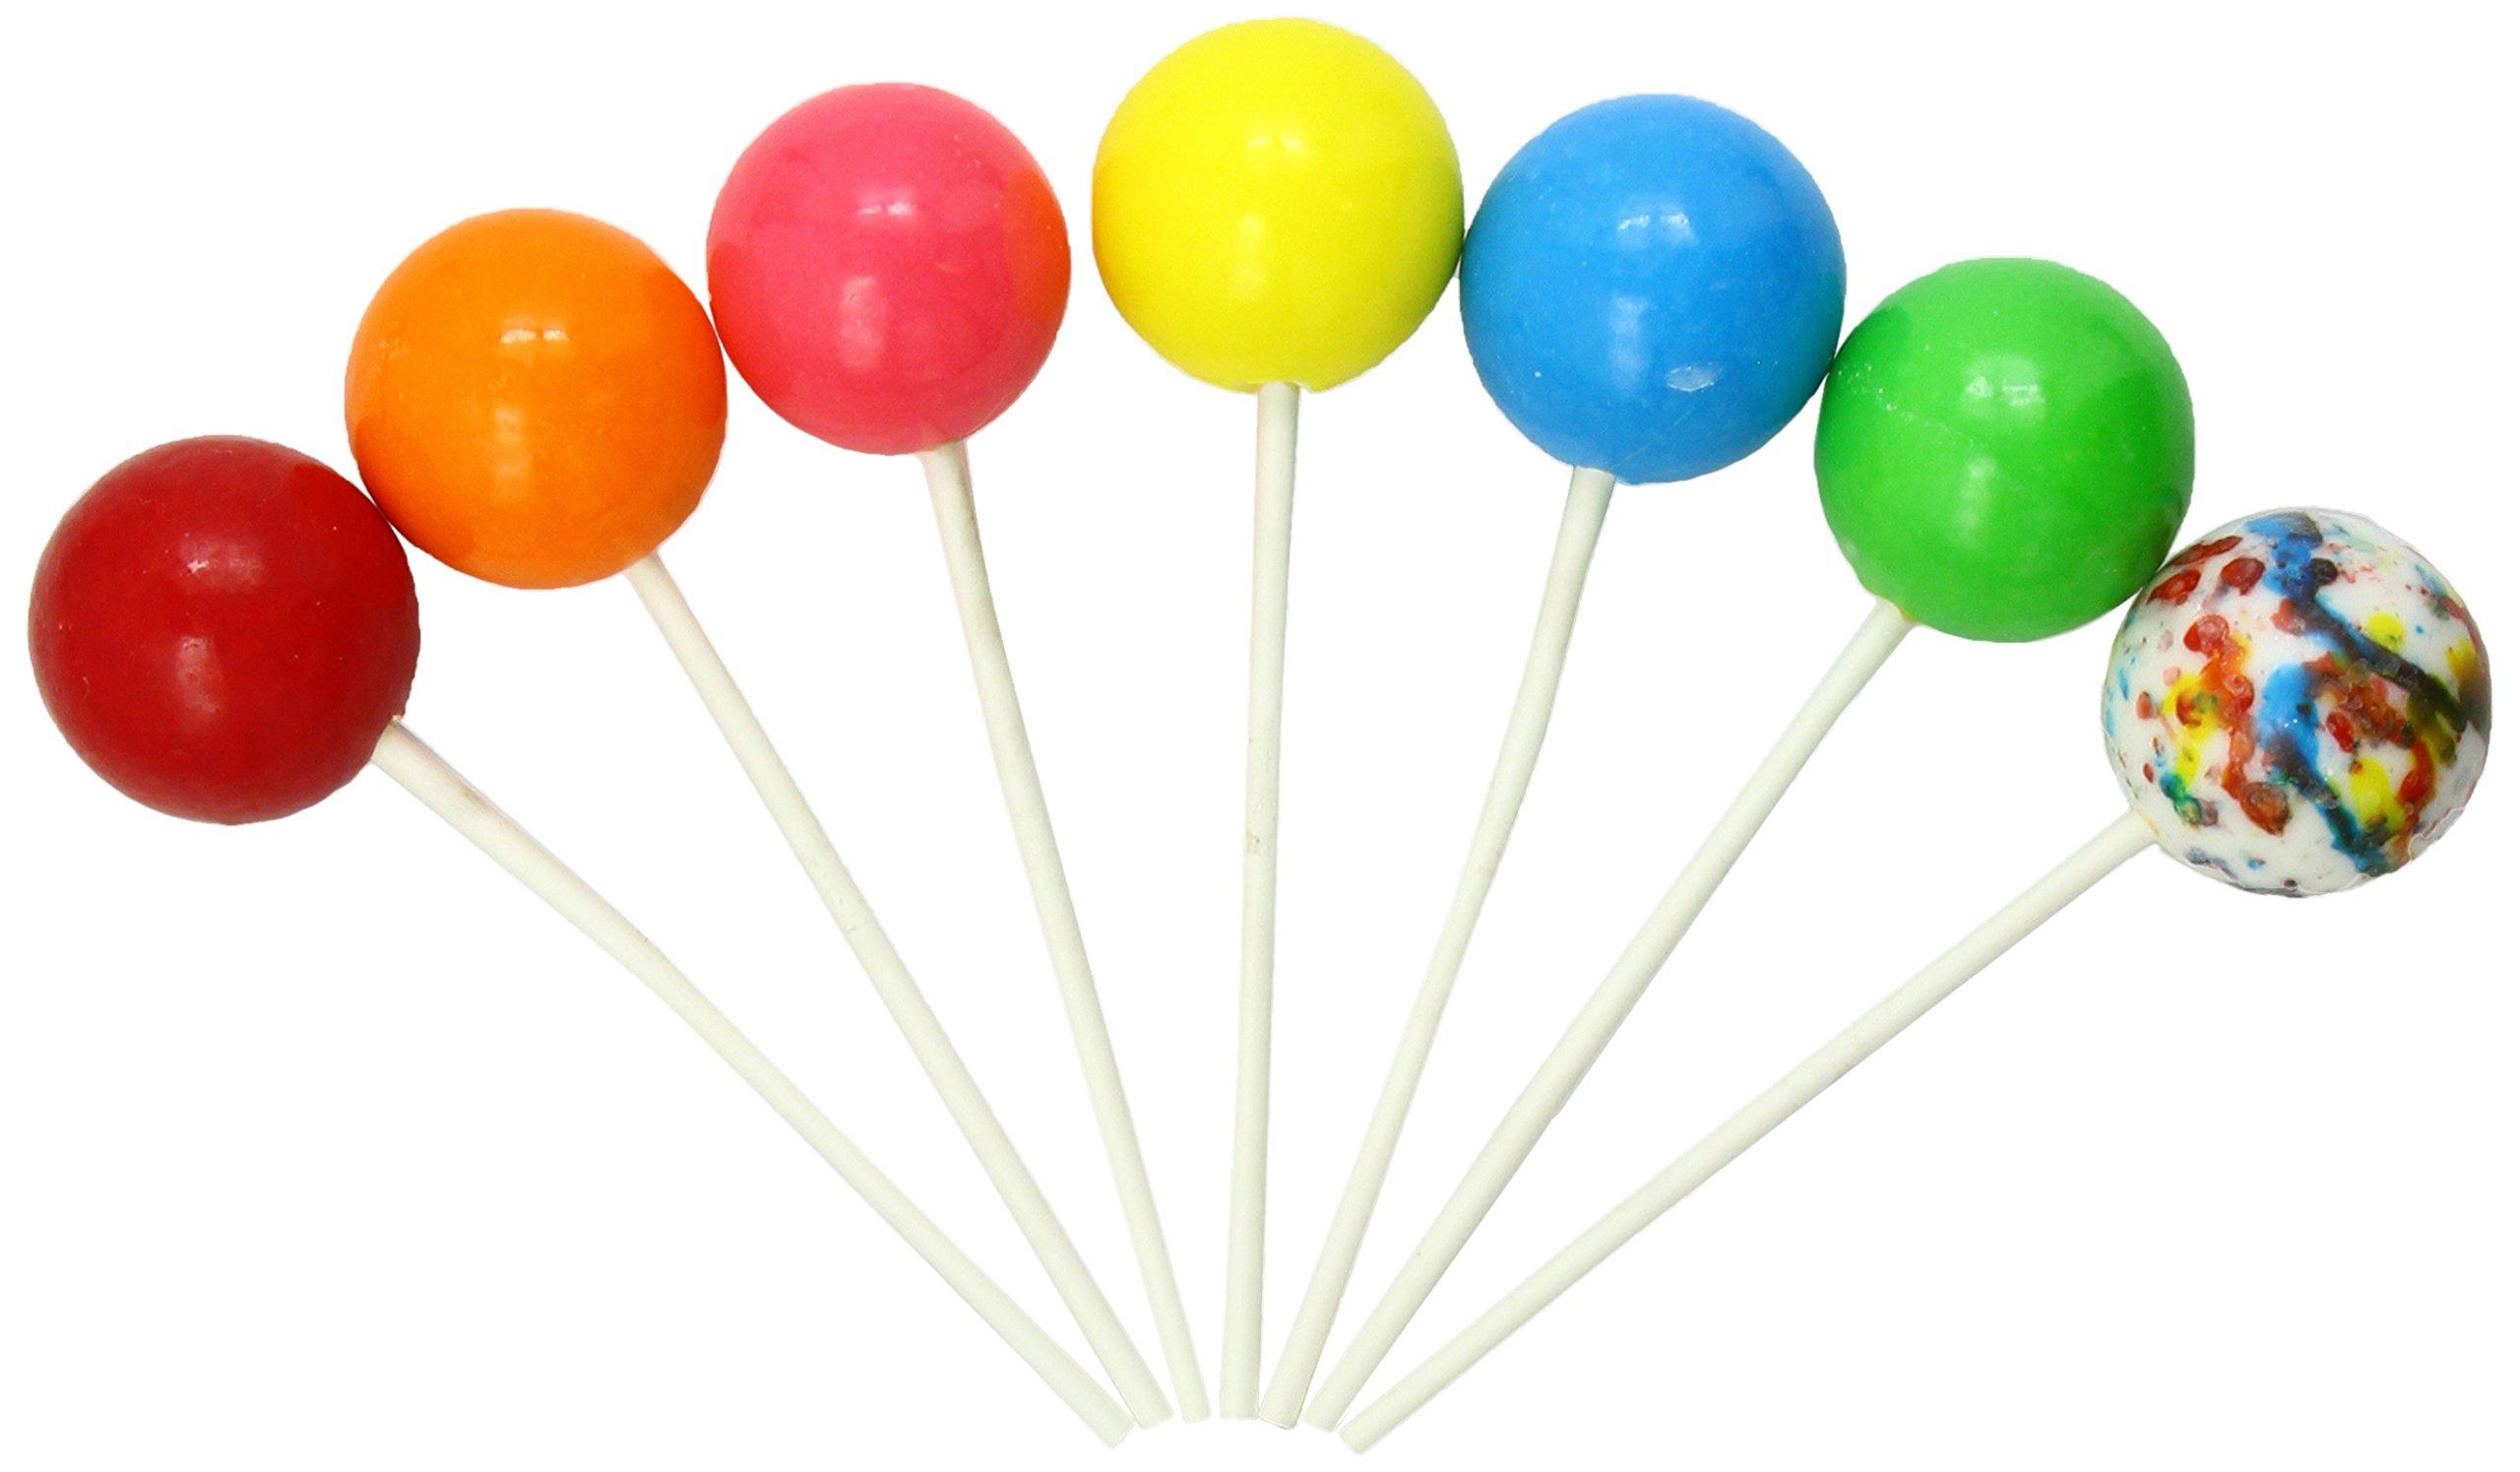 Jawlipops Lollipop Refill, 25-Count by Jawlipops (Image #1)